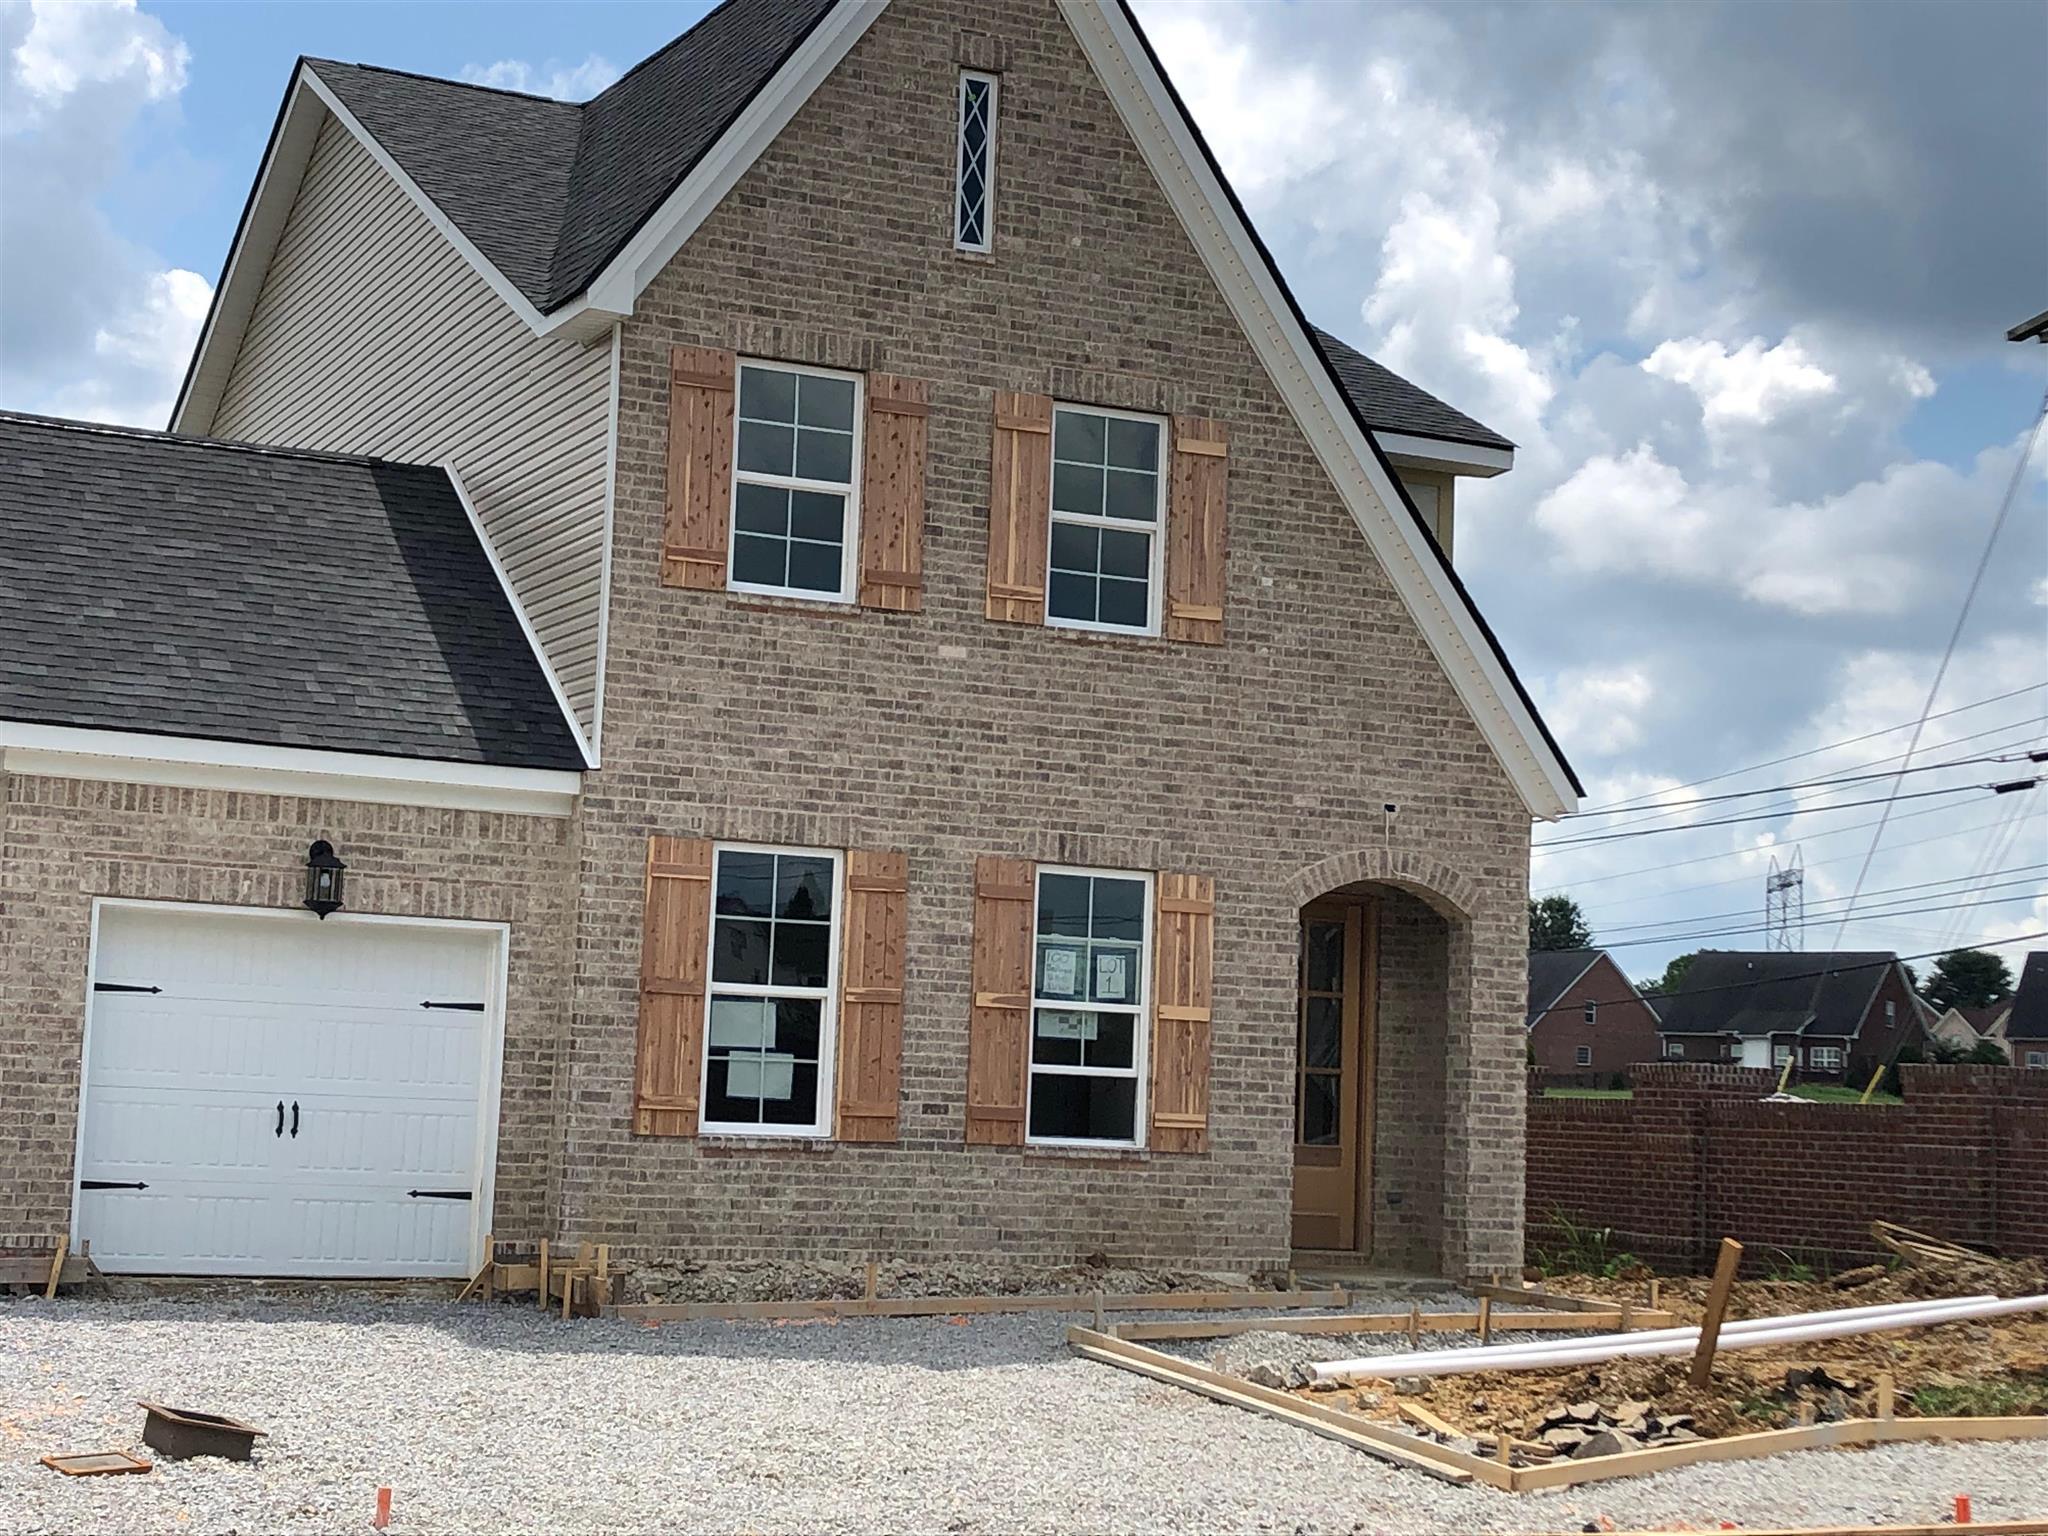 100 Bellagio Villas Dr Lot 1, Spring Hill, TN 37174 - Spring Hill, TN real estate listing